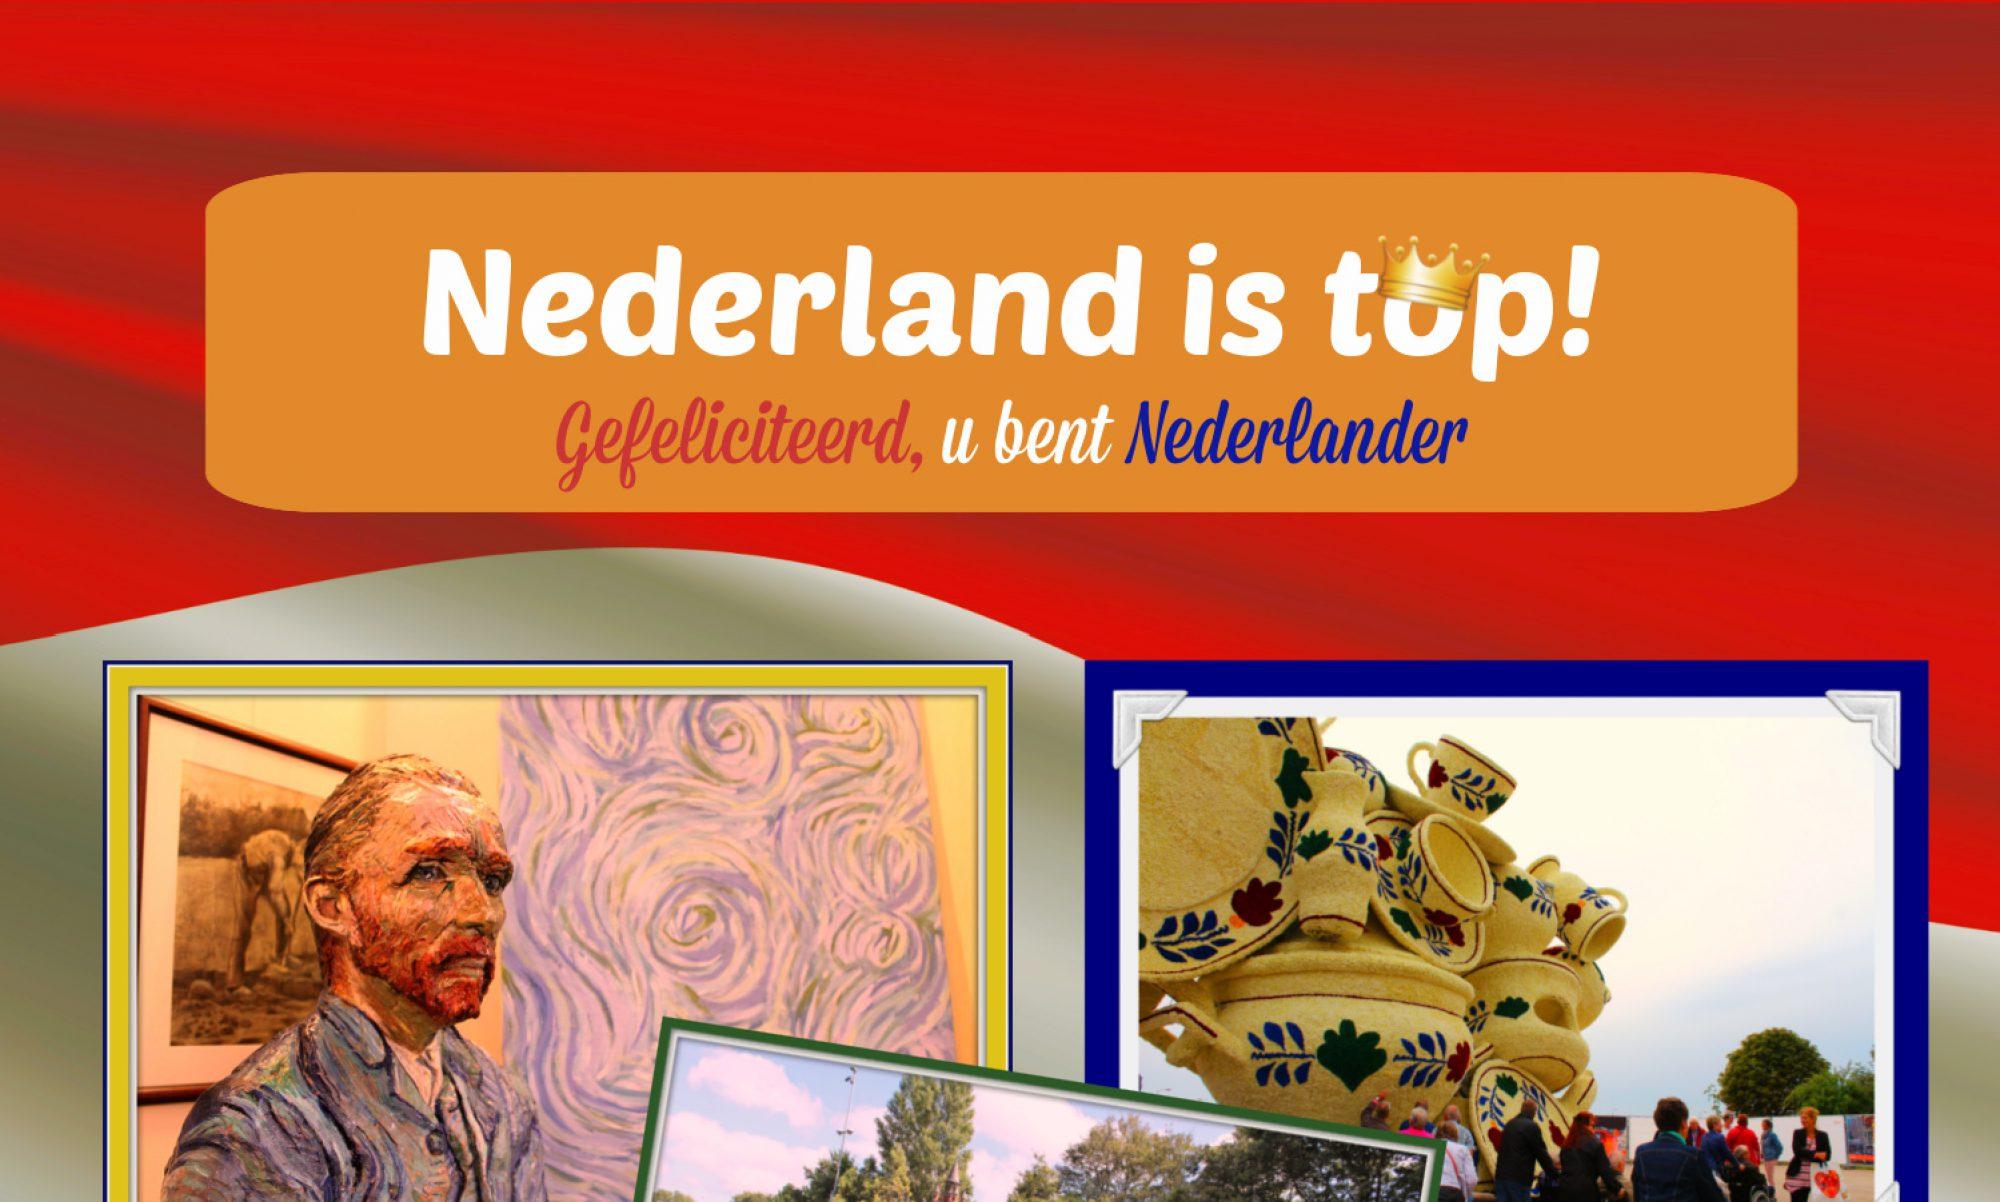 Nederland is top!